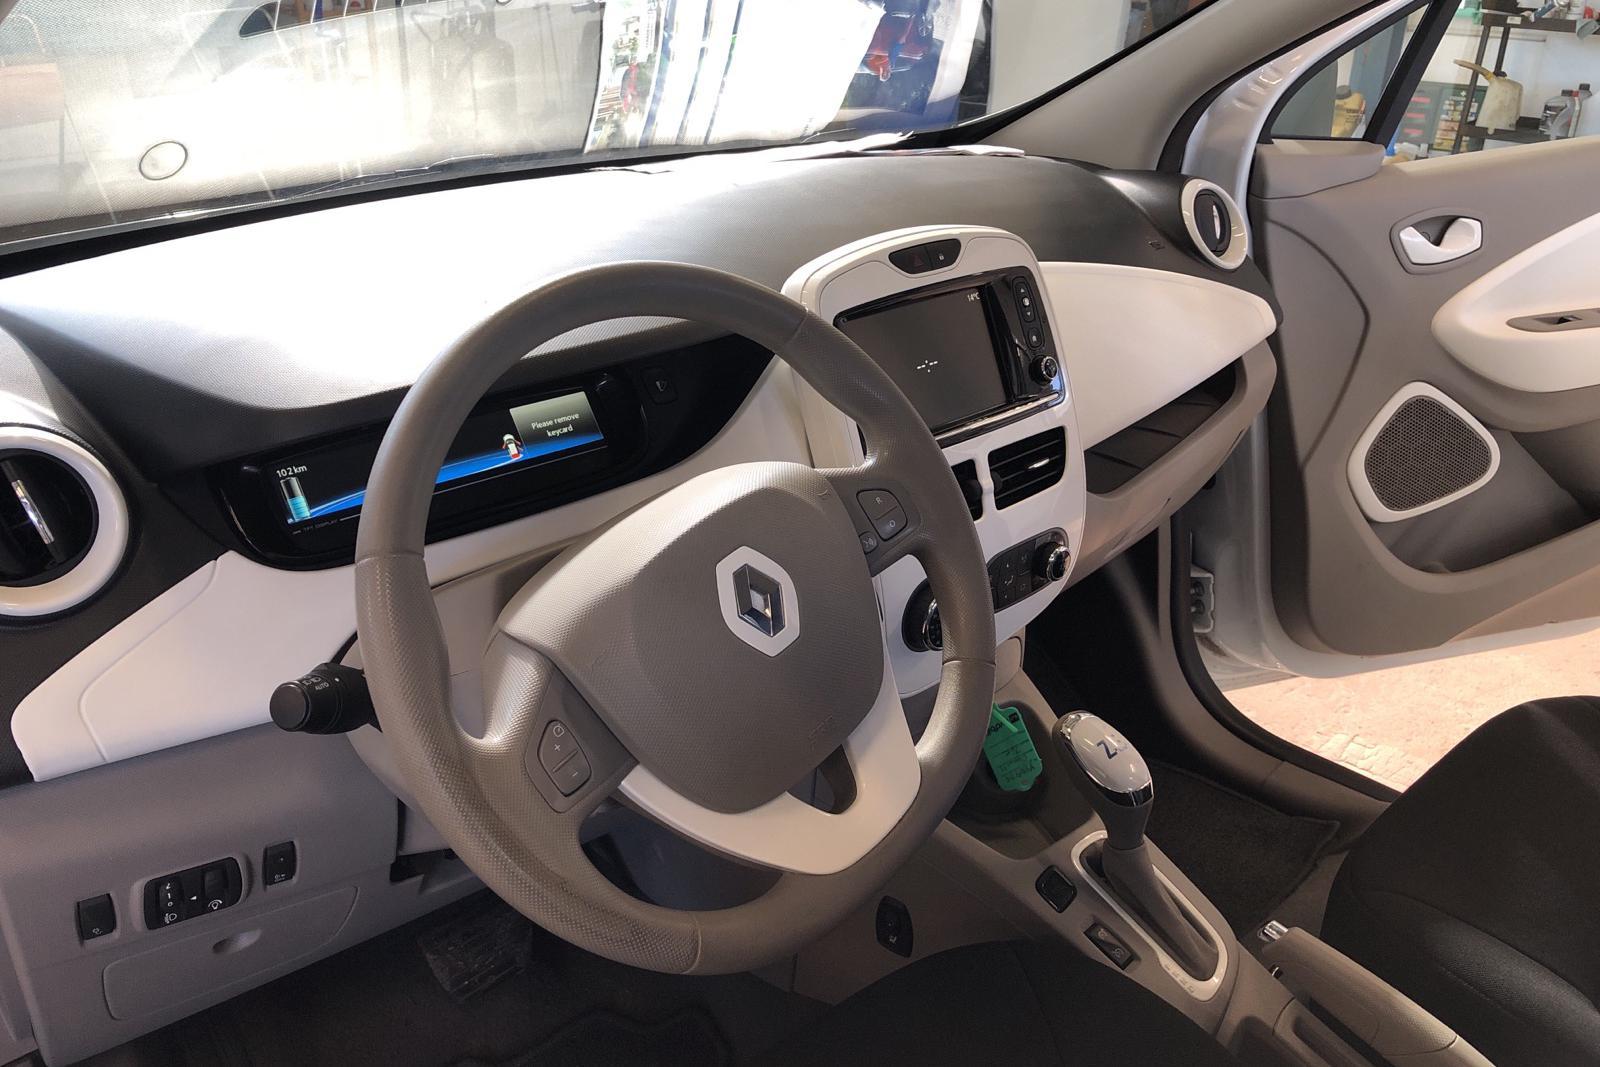 Renault Zoe 41 kWh R90 (92hk) - 59 560 km - Automatic - white - 2019